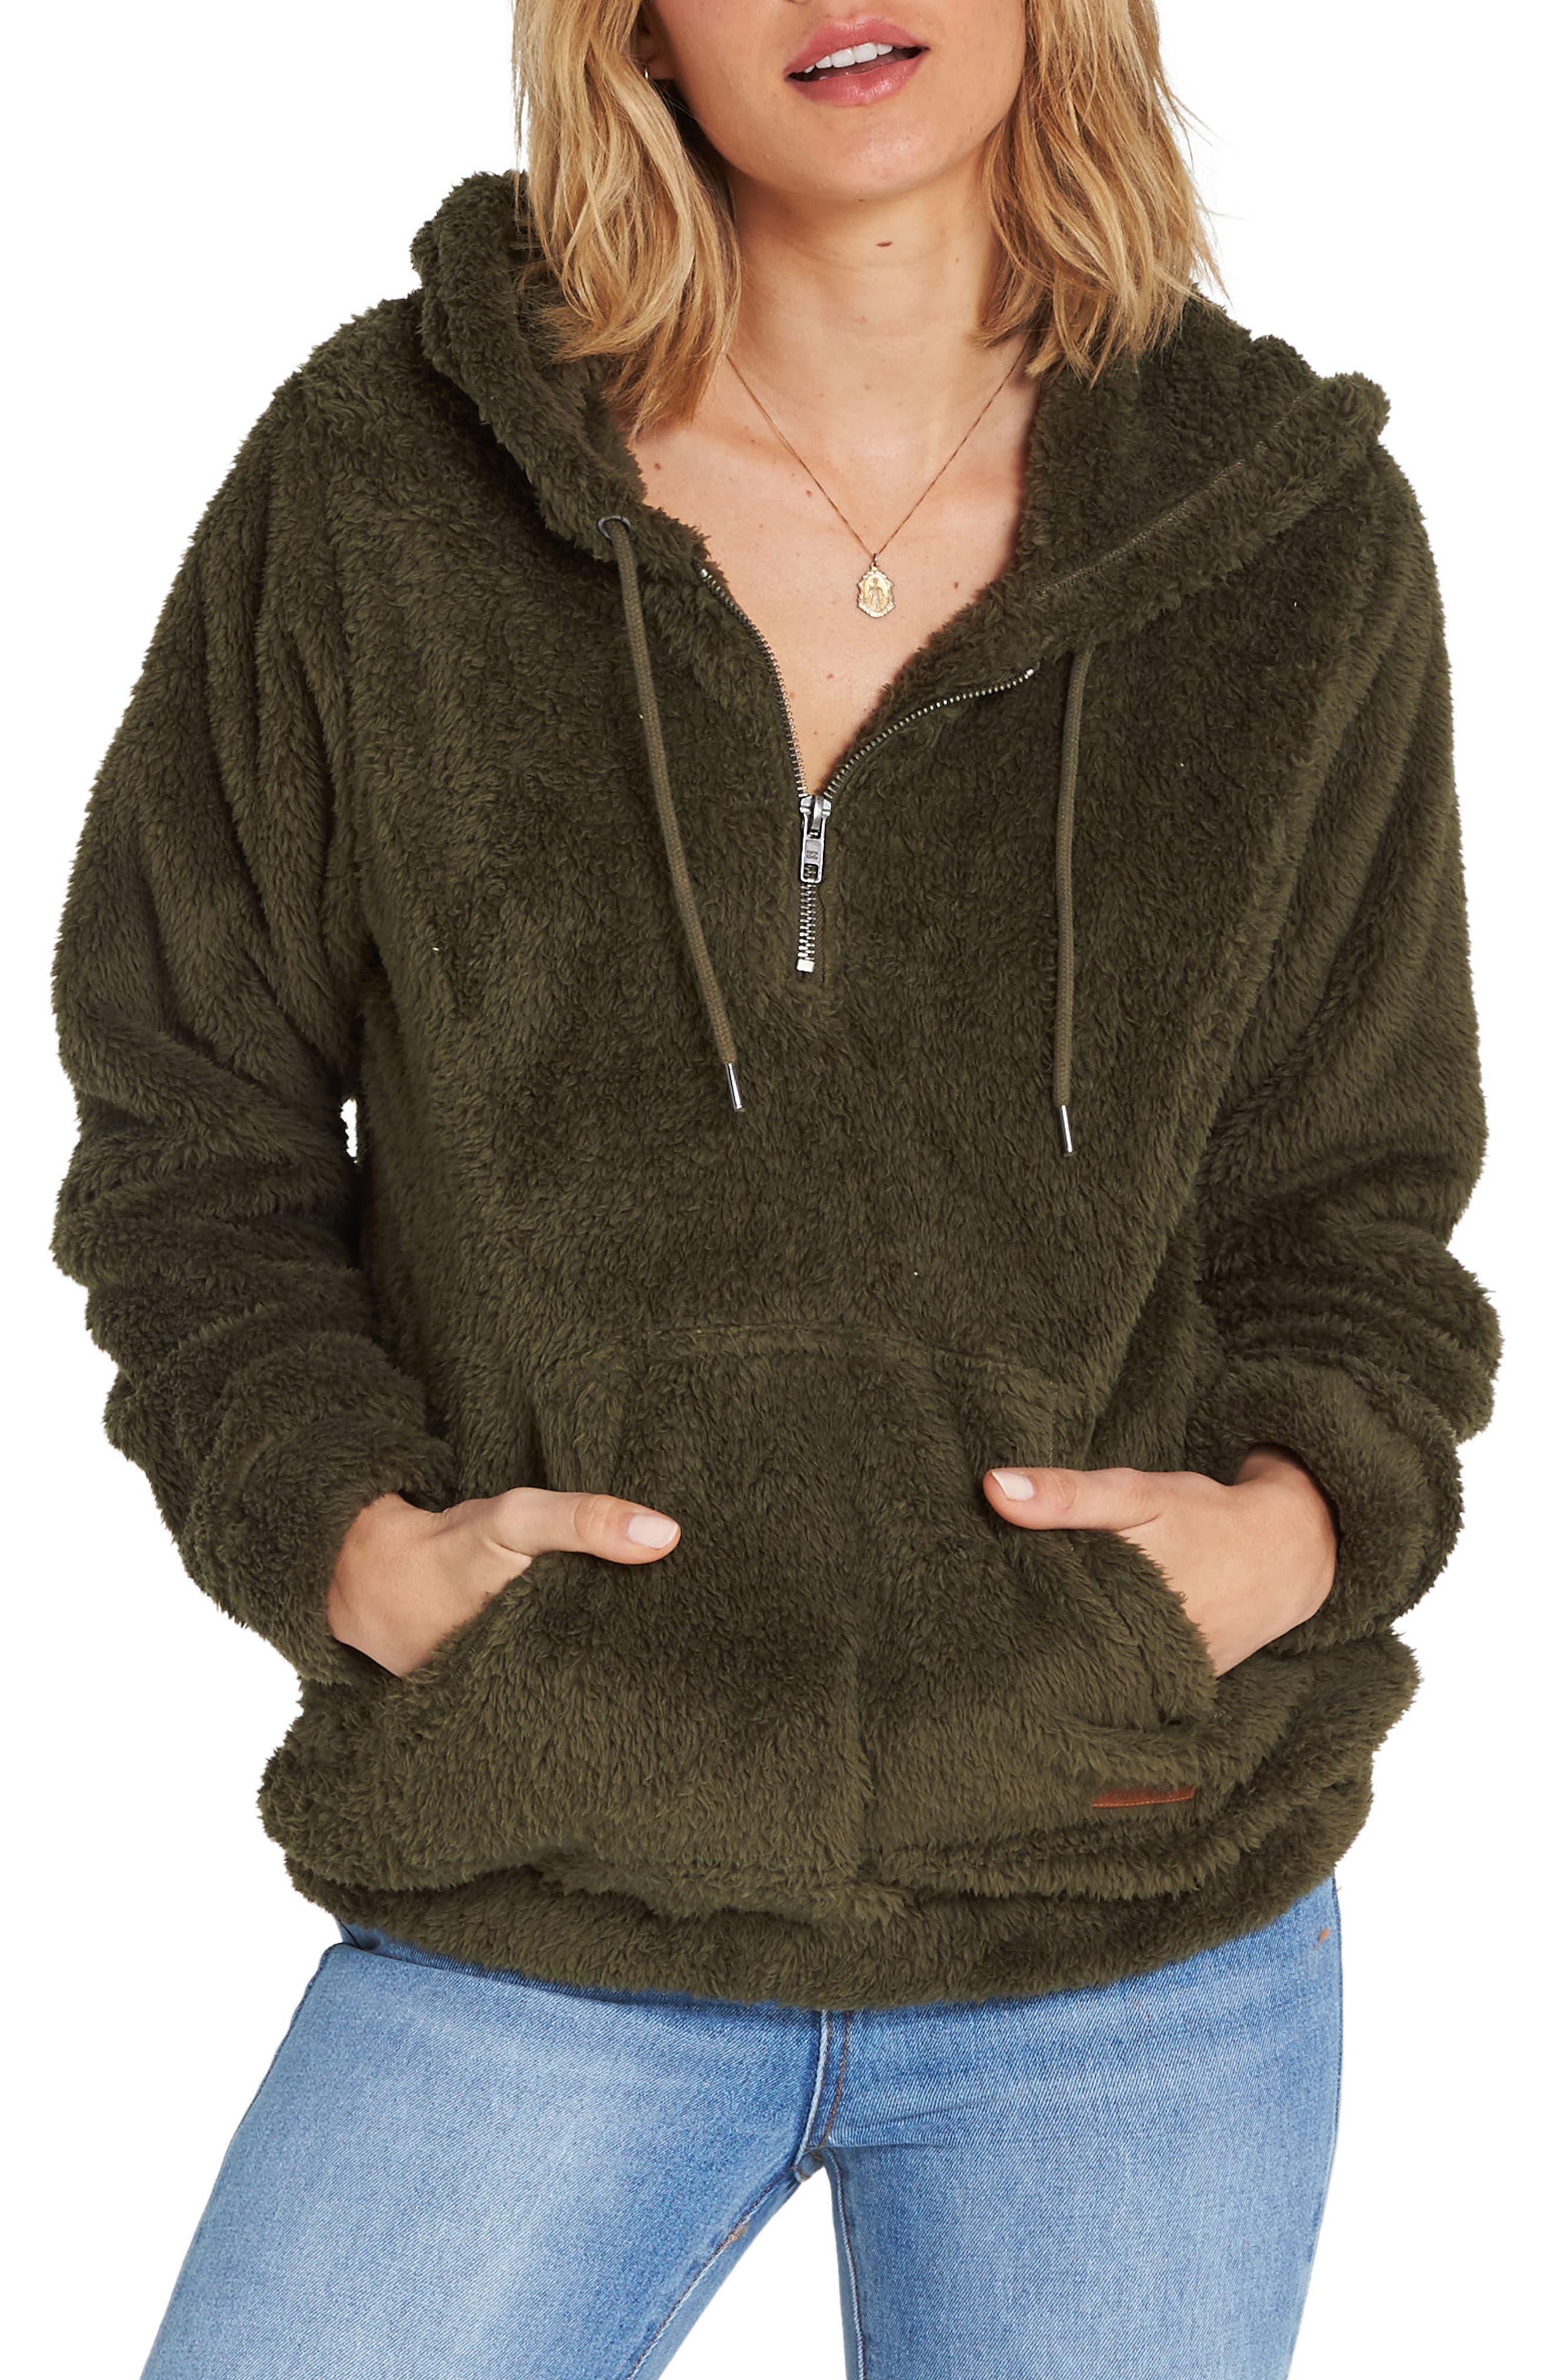 Cozy for Keeps Fleece Zip Hoodie,                             Main thumbnail 1, color,                             OLIVE